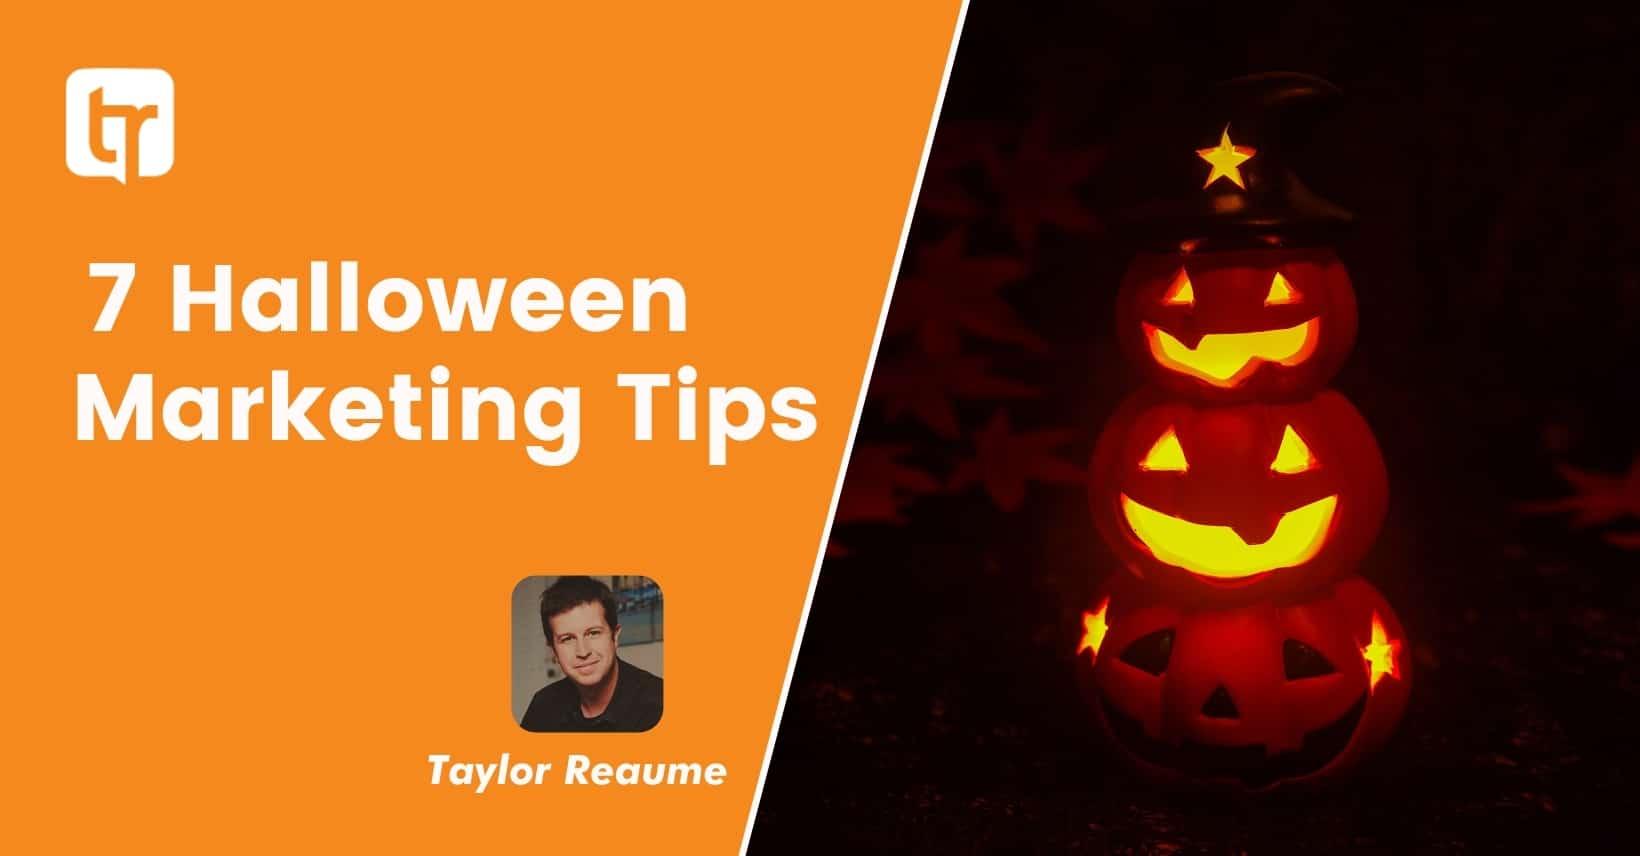 7 Halloween Marketing Tips